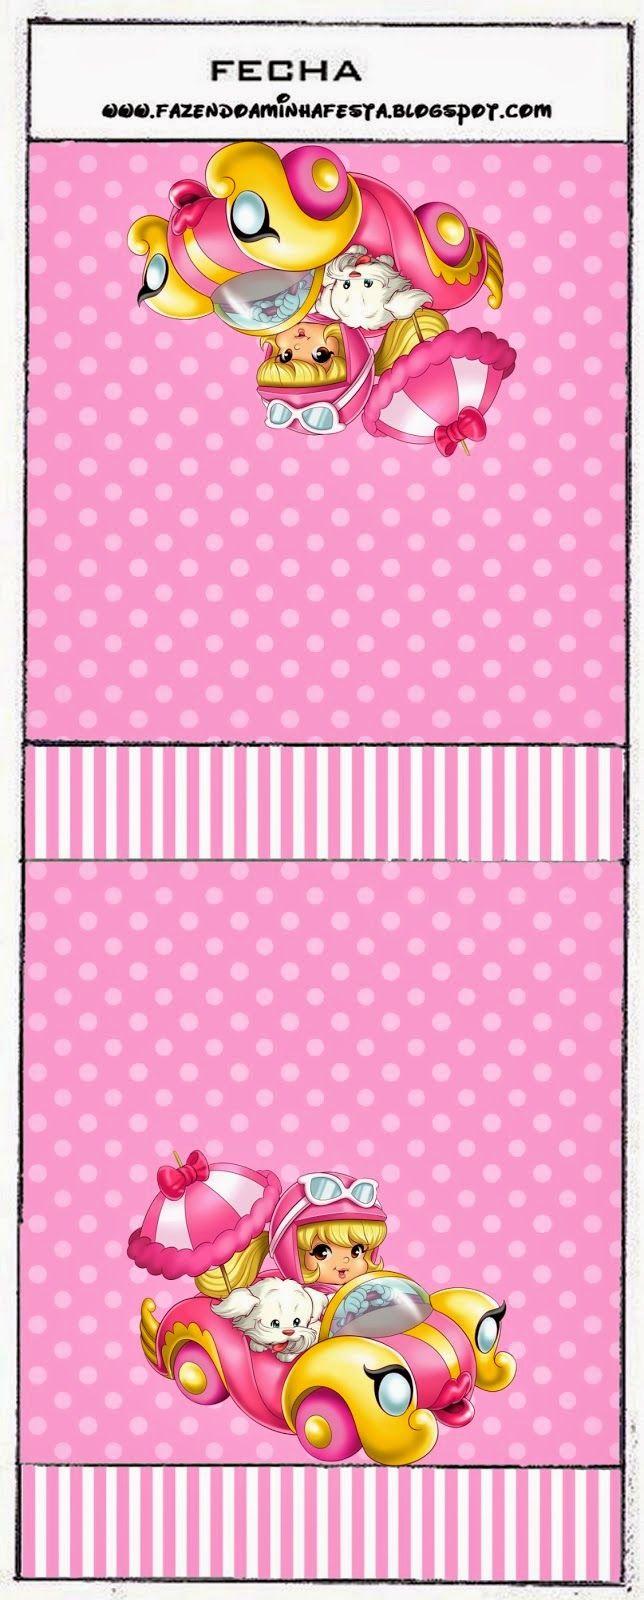 Penelope Glamour Bebé: Etiquetas para Candy Bar para Imprimir Gratis ...